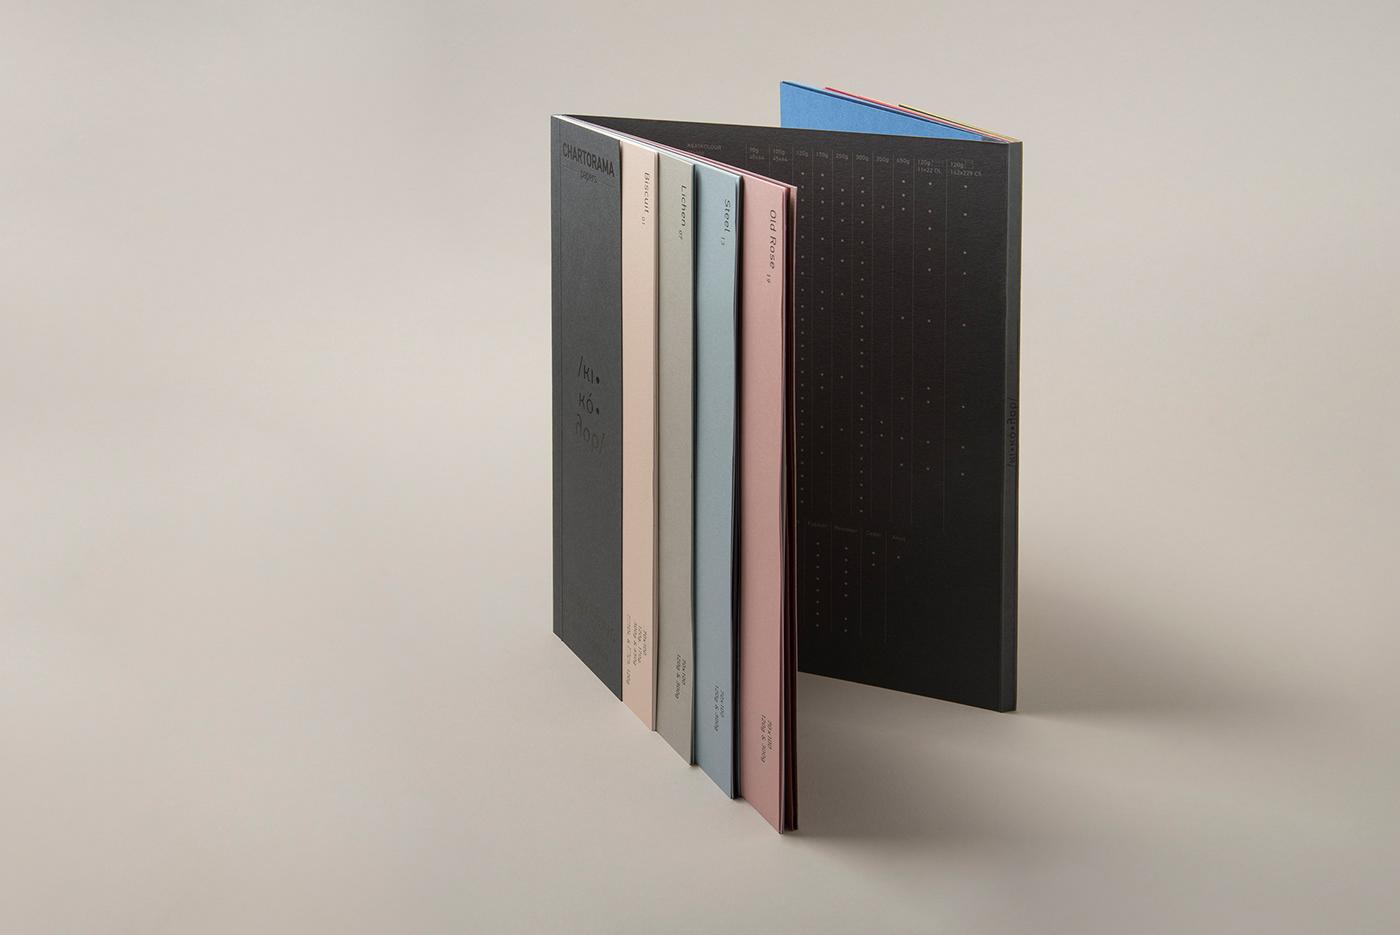 editorial design  book design special edition Keaykolour Arjowiggins paper colour regina souli studio Common Ground graphic design